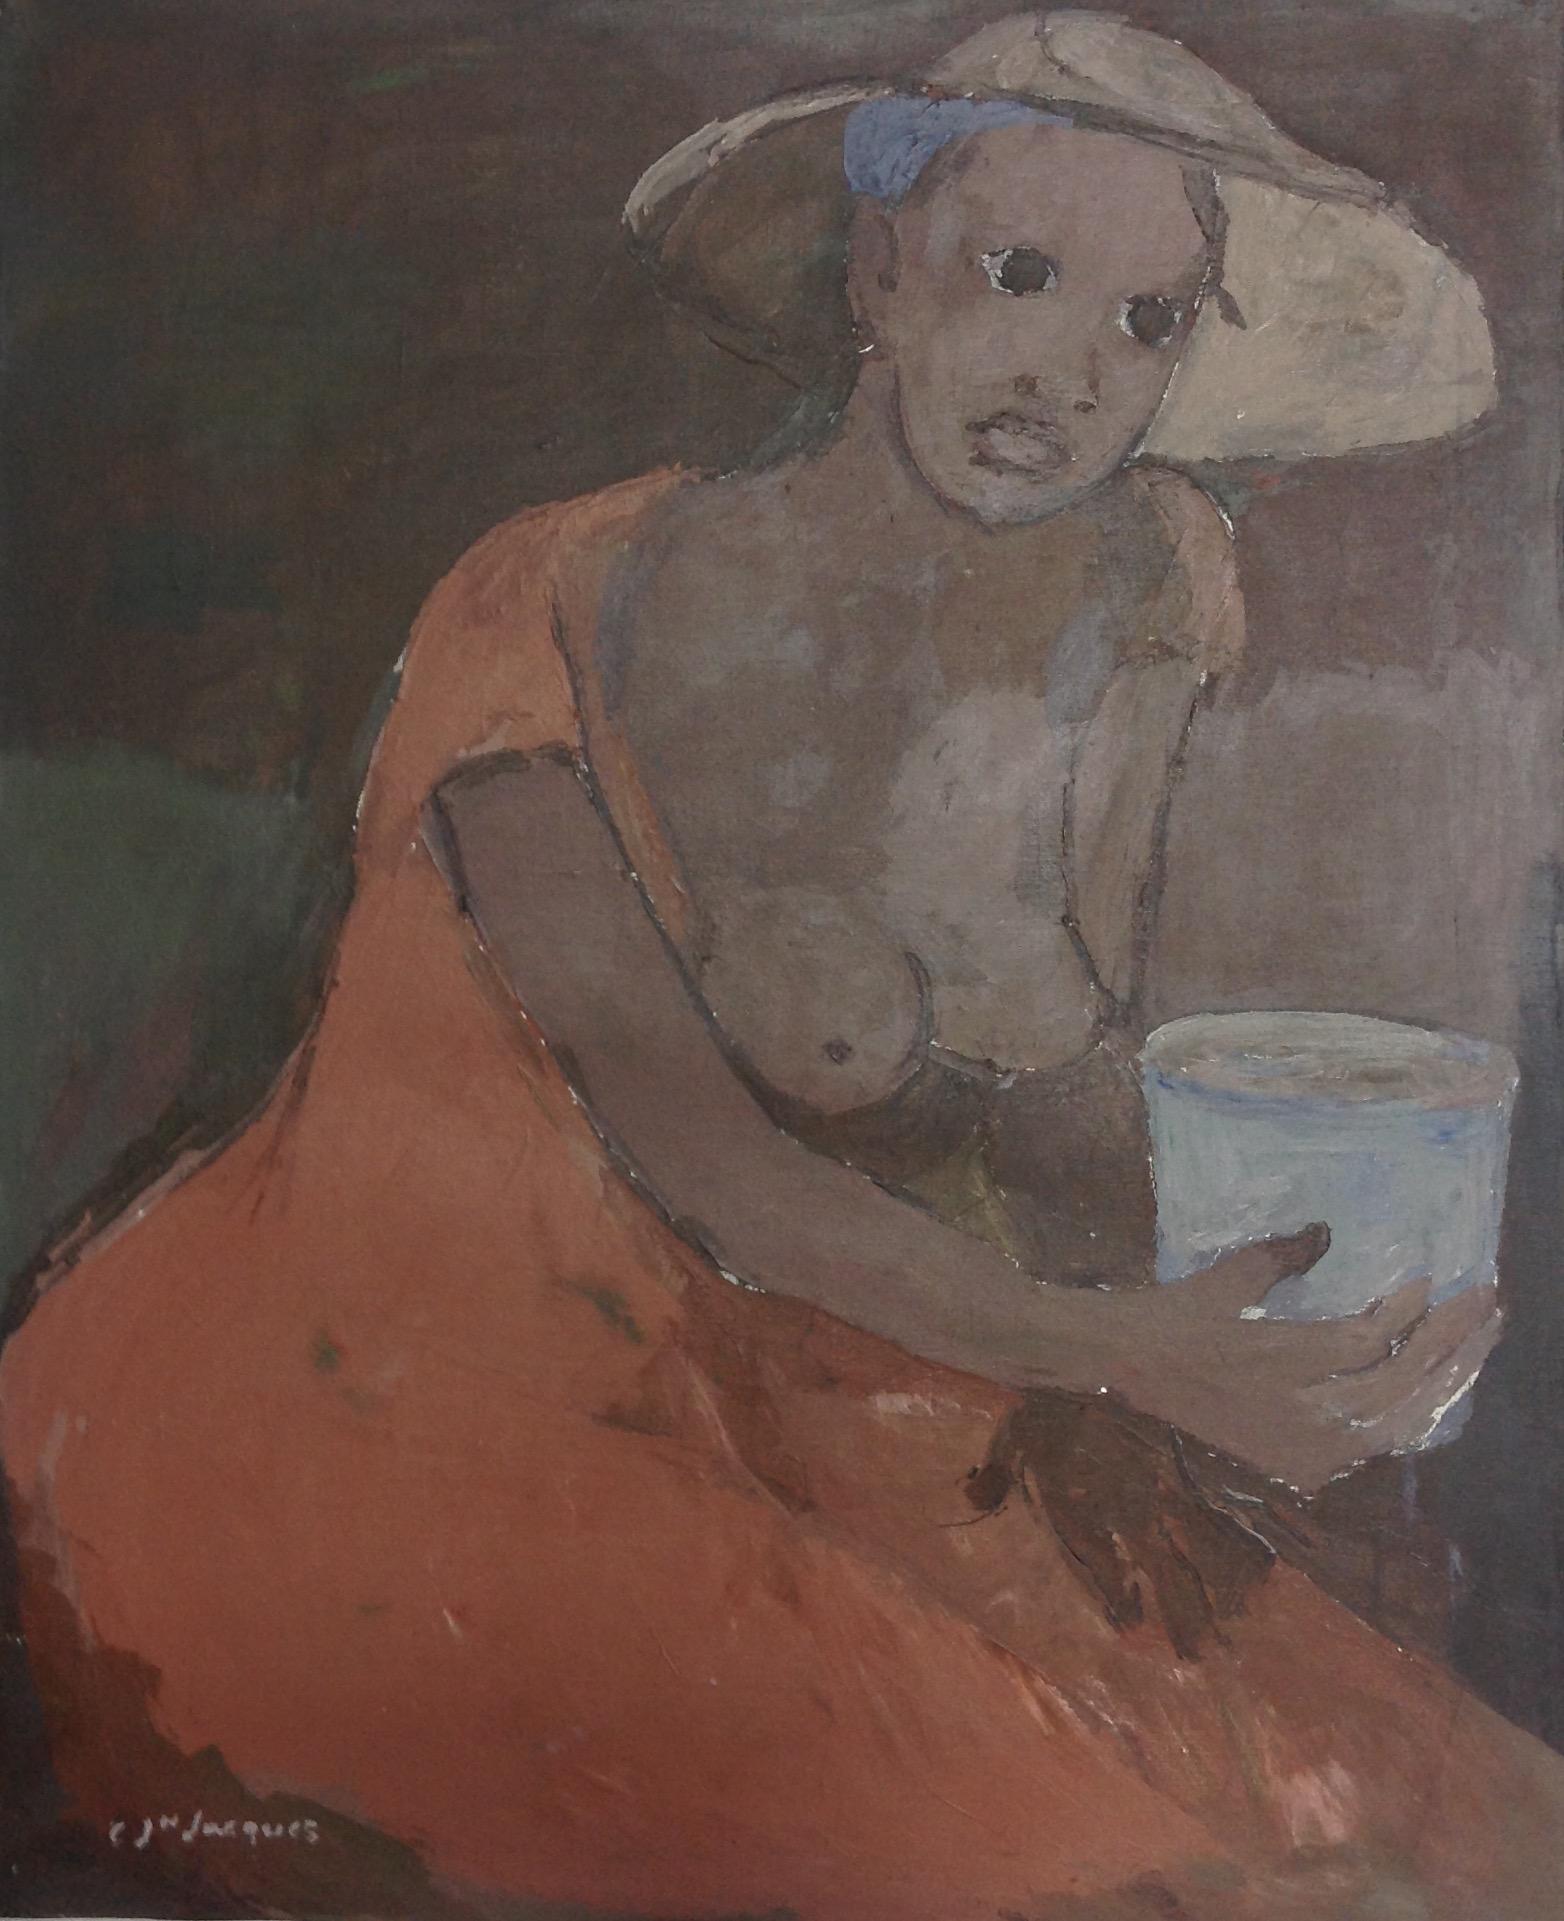 Jn Jacques Carlo 24X30 #9-2-95 canvas